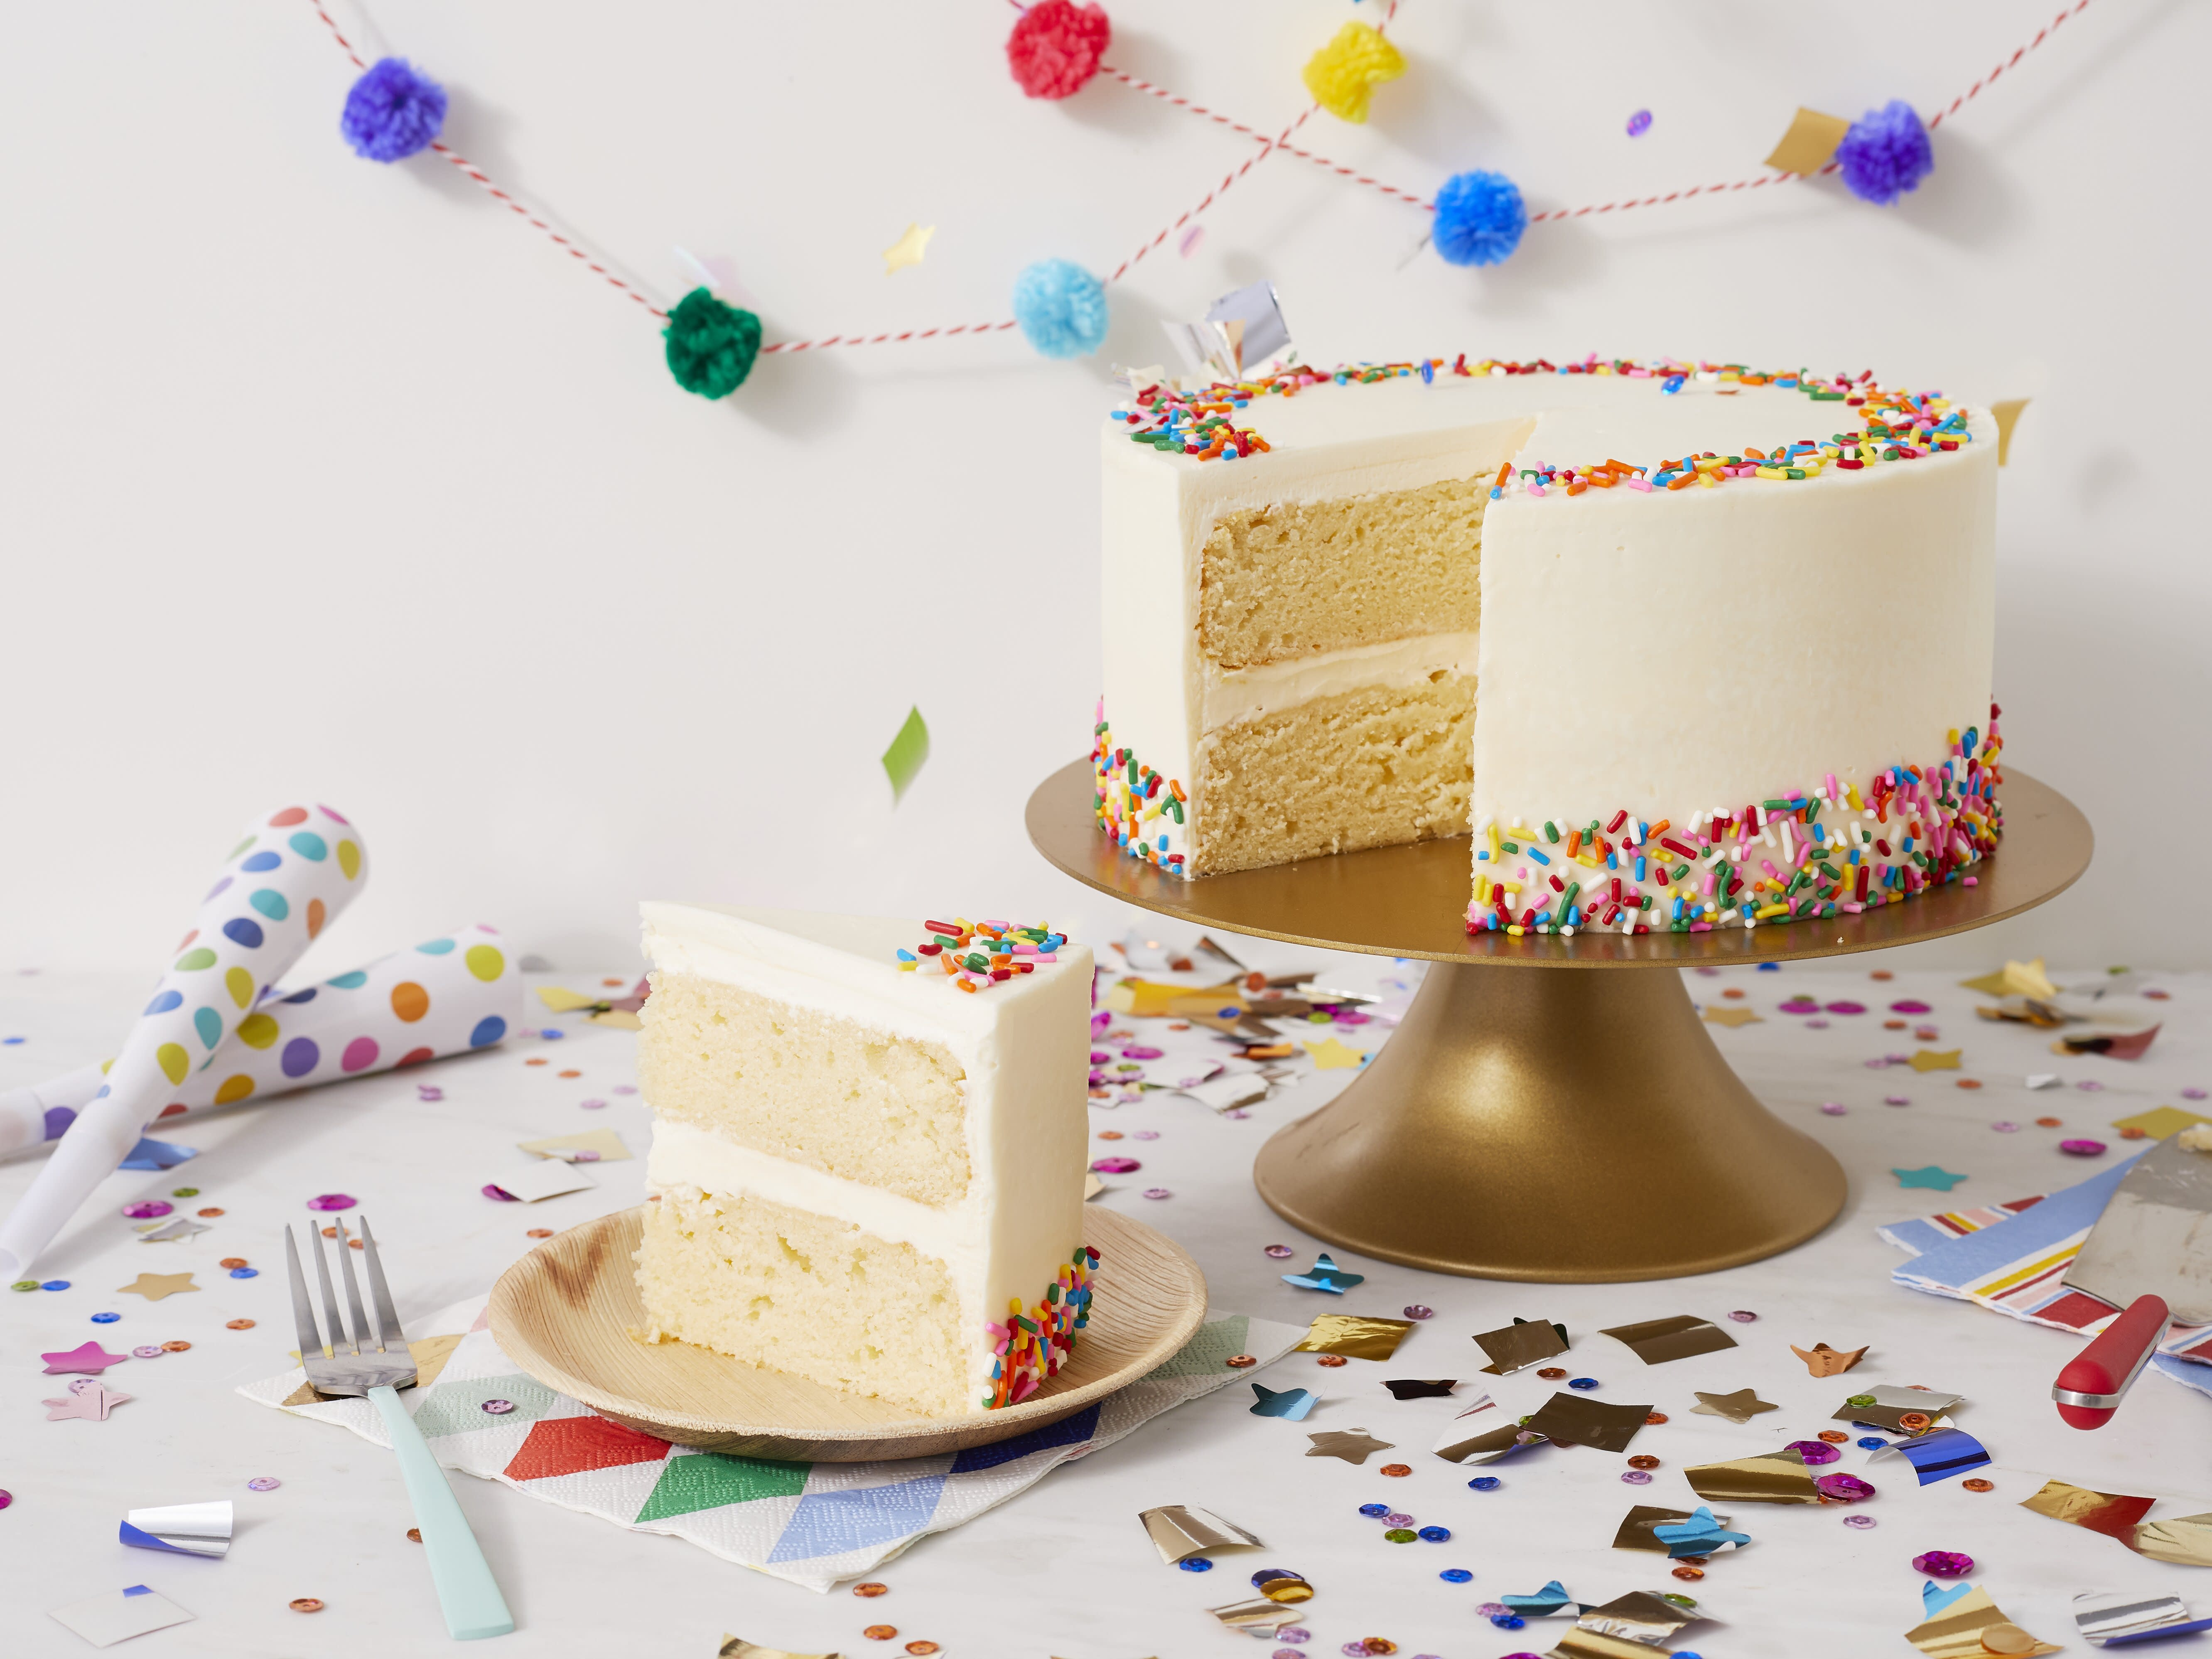 Wondrous Betty Crocker Wants To Give You Free Cake For Your Quarantine Birthday Funny Birthday Cards Online Elaedamsfinfo